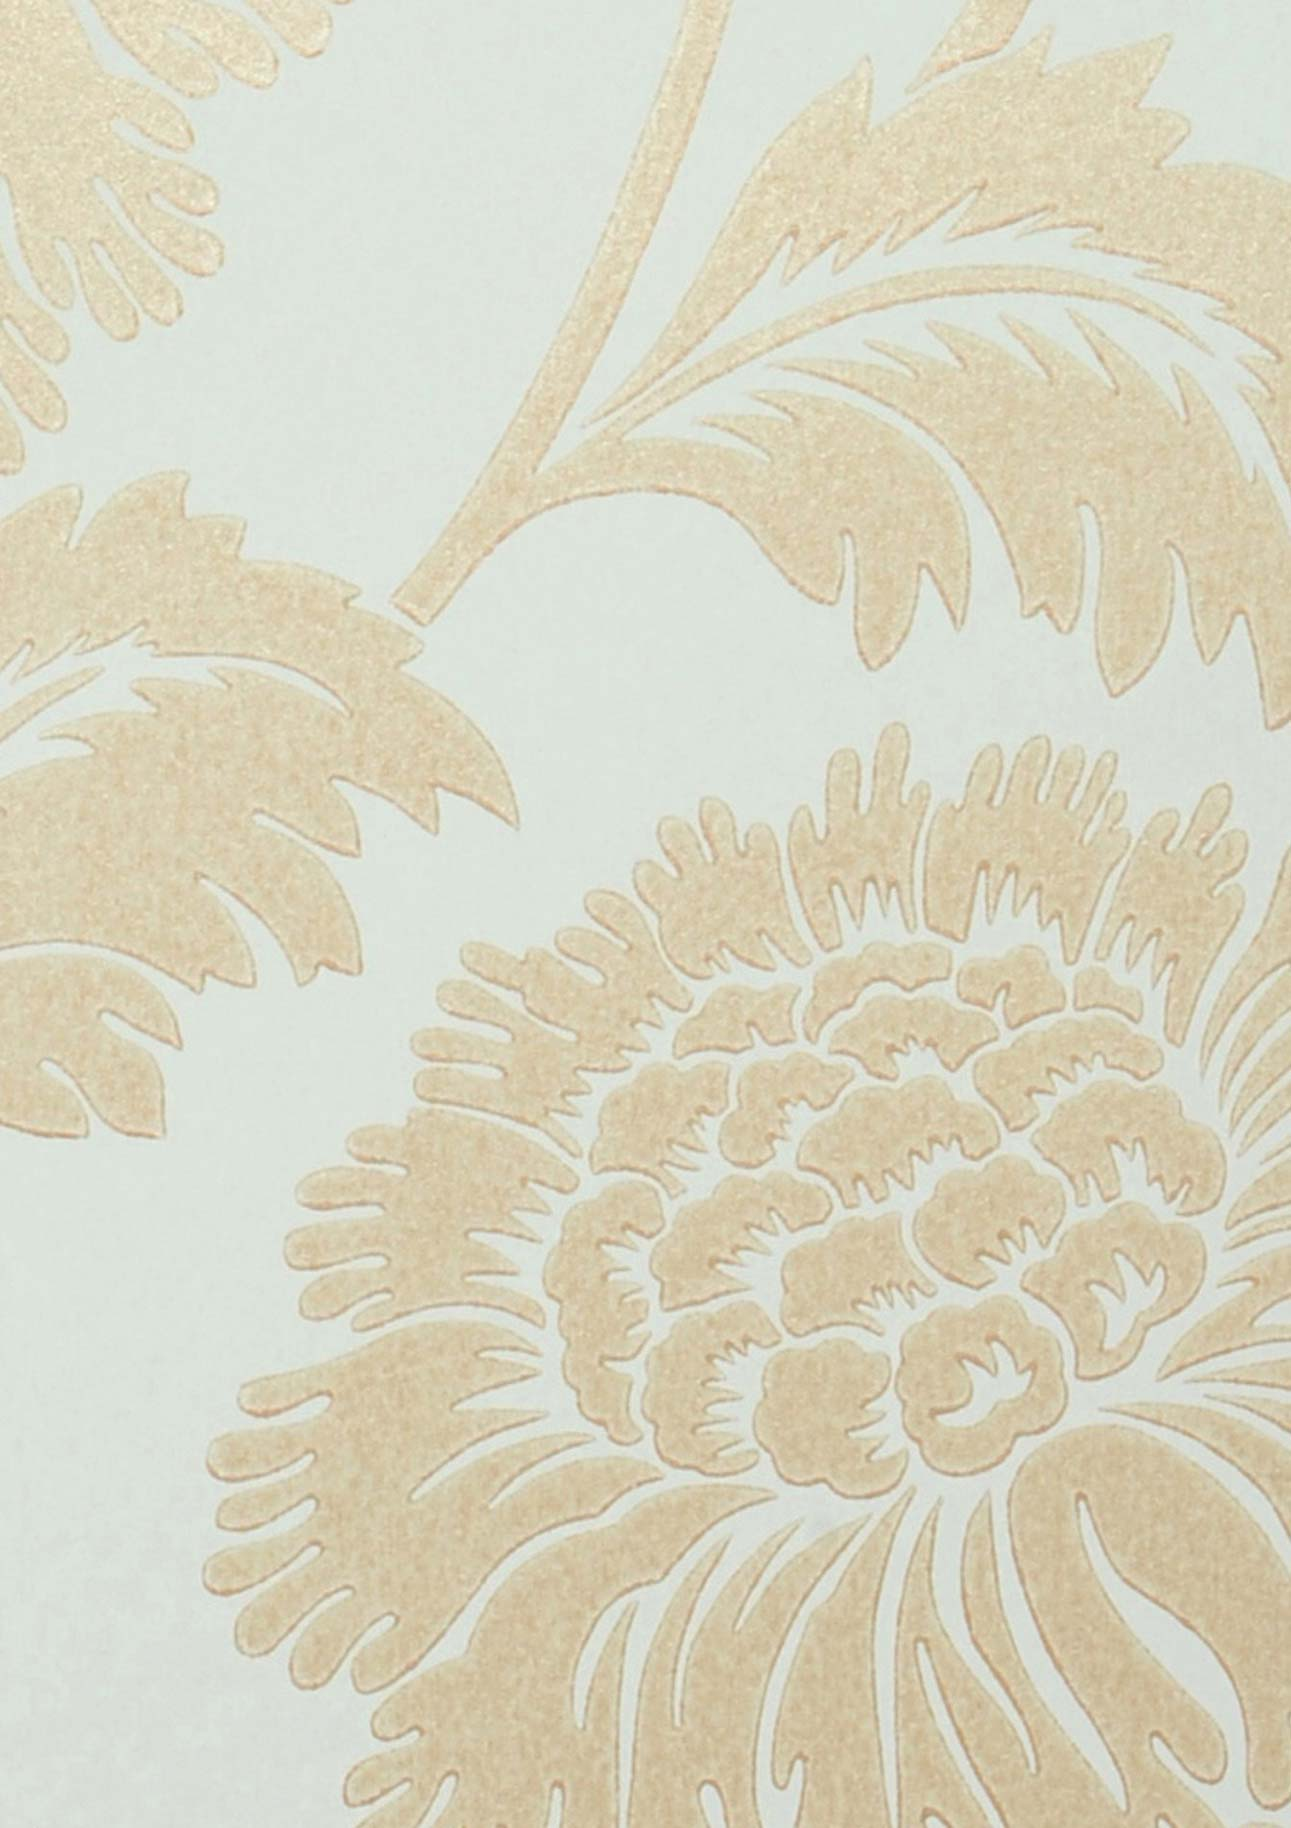 zarya coquille d 39 uf dor papier peint floral motifs du papier peint papier peint des. Black Bedroom Furniture Sets. Home Design Ideas